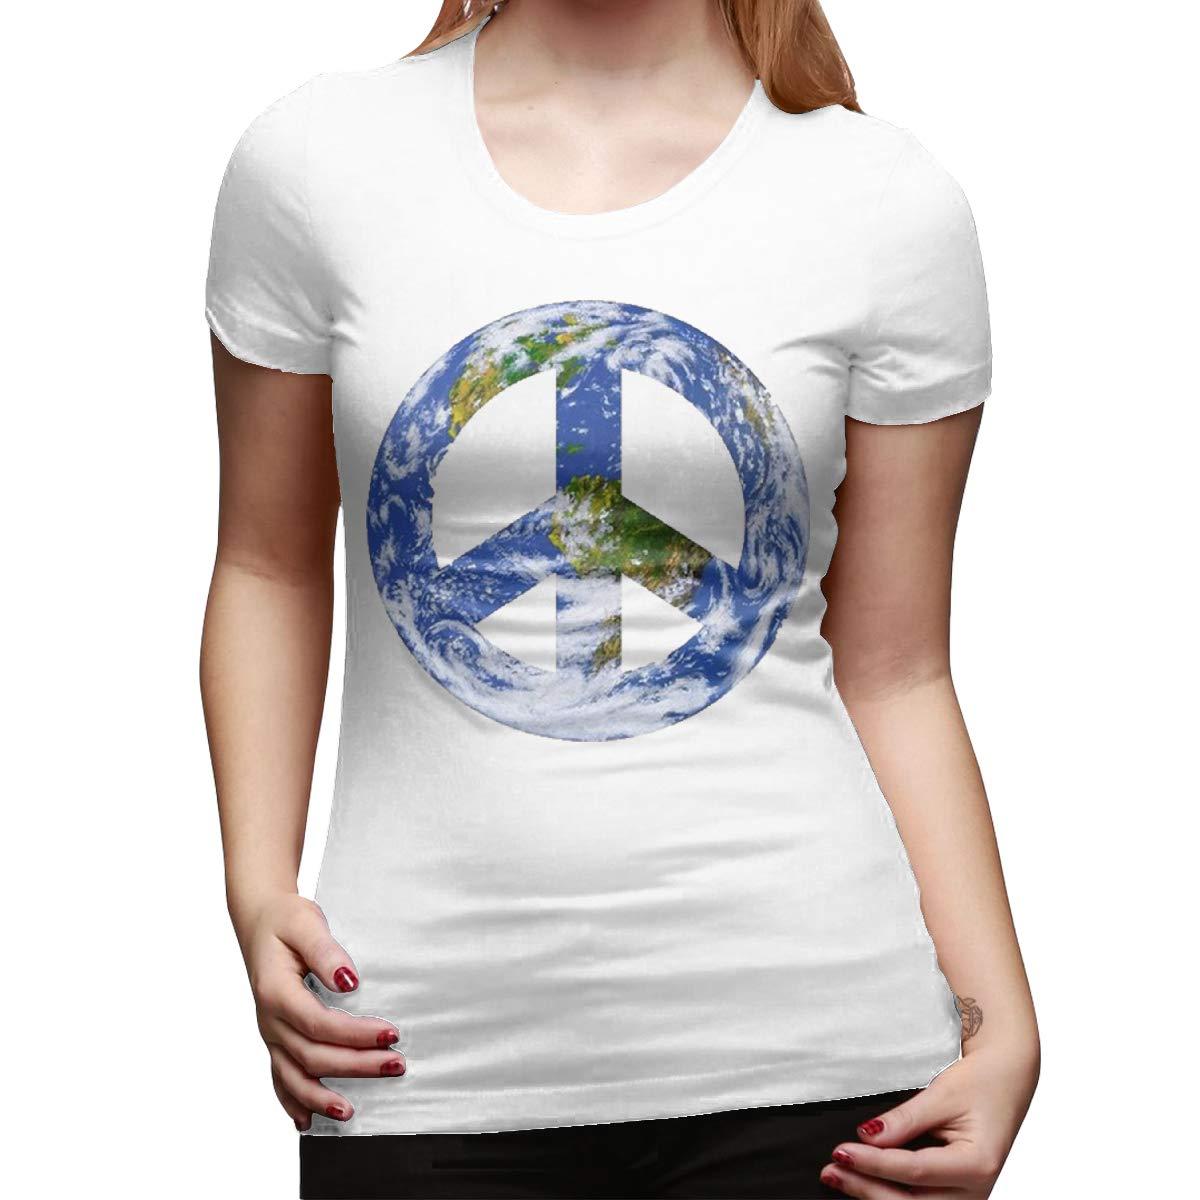 Smooffly Women World Peace Sign Crew Neck Short Sleeve Tee